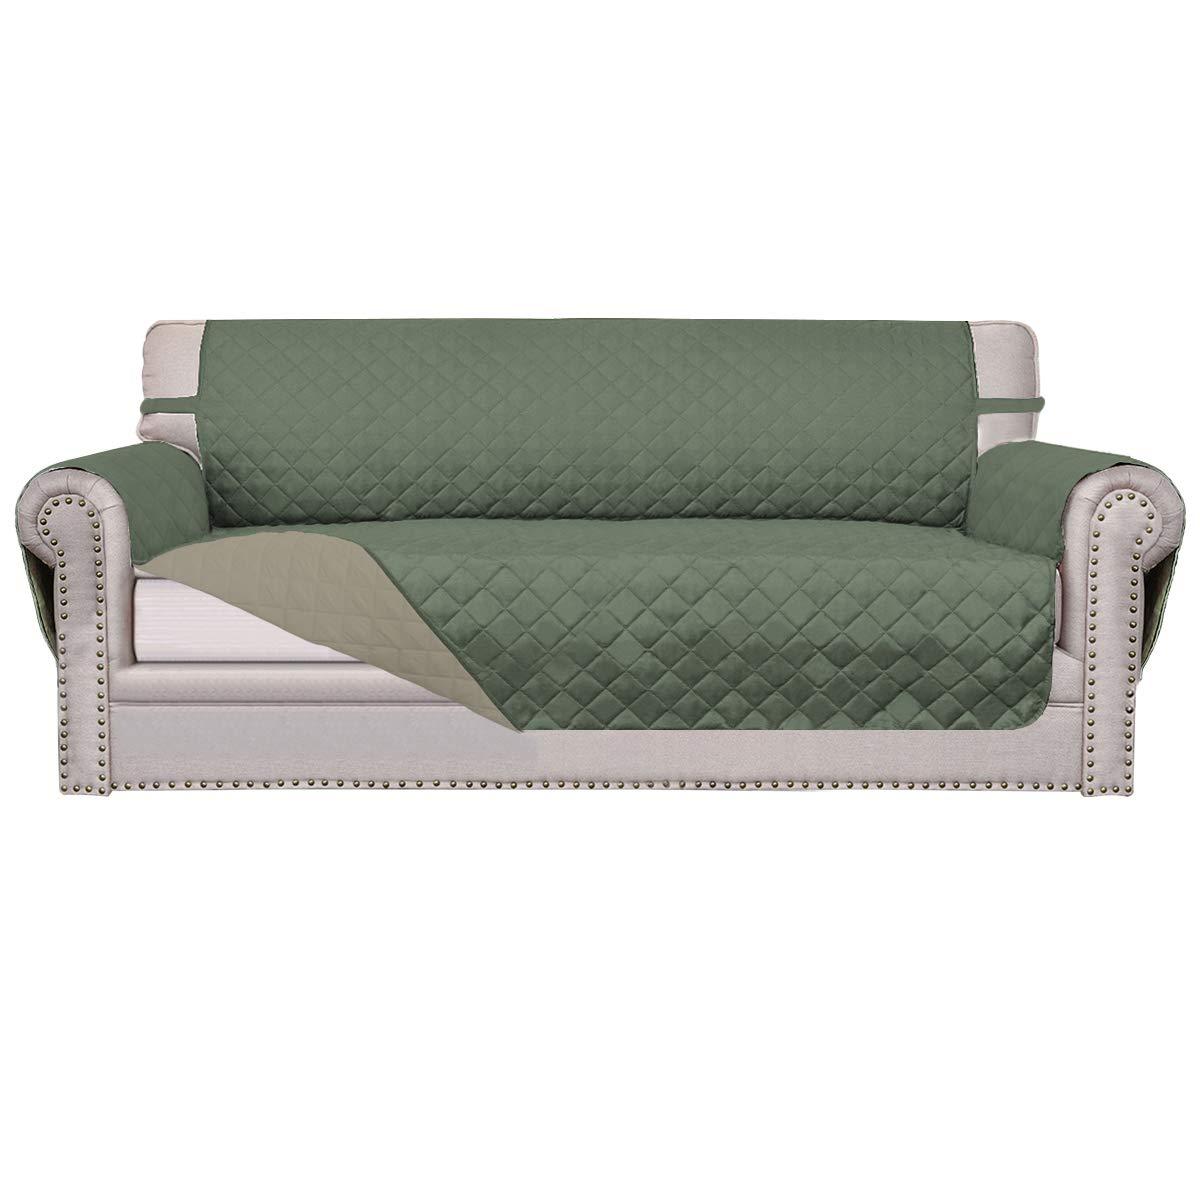 Easy-Going Sofa Slipcover Reversible Sofa Cover Furniture Protector Couch Shield Water Resistant Elastic Straps PetsKidsChildrenDogCat(Sofa,Greyish Green/Beige)